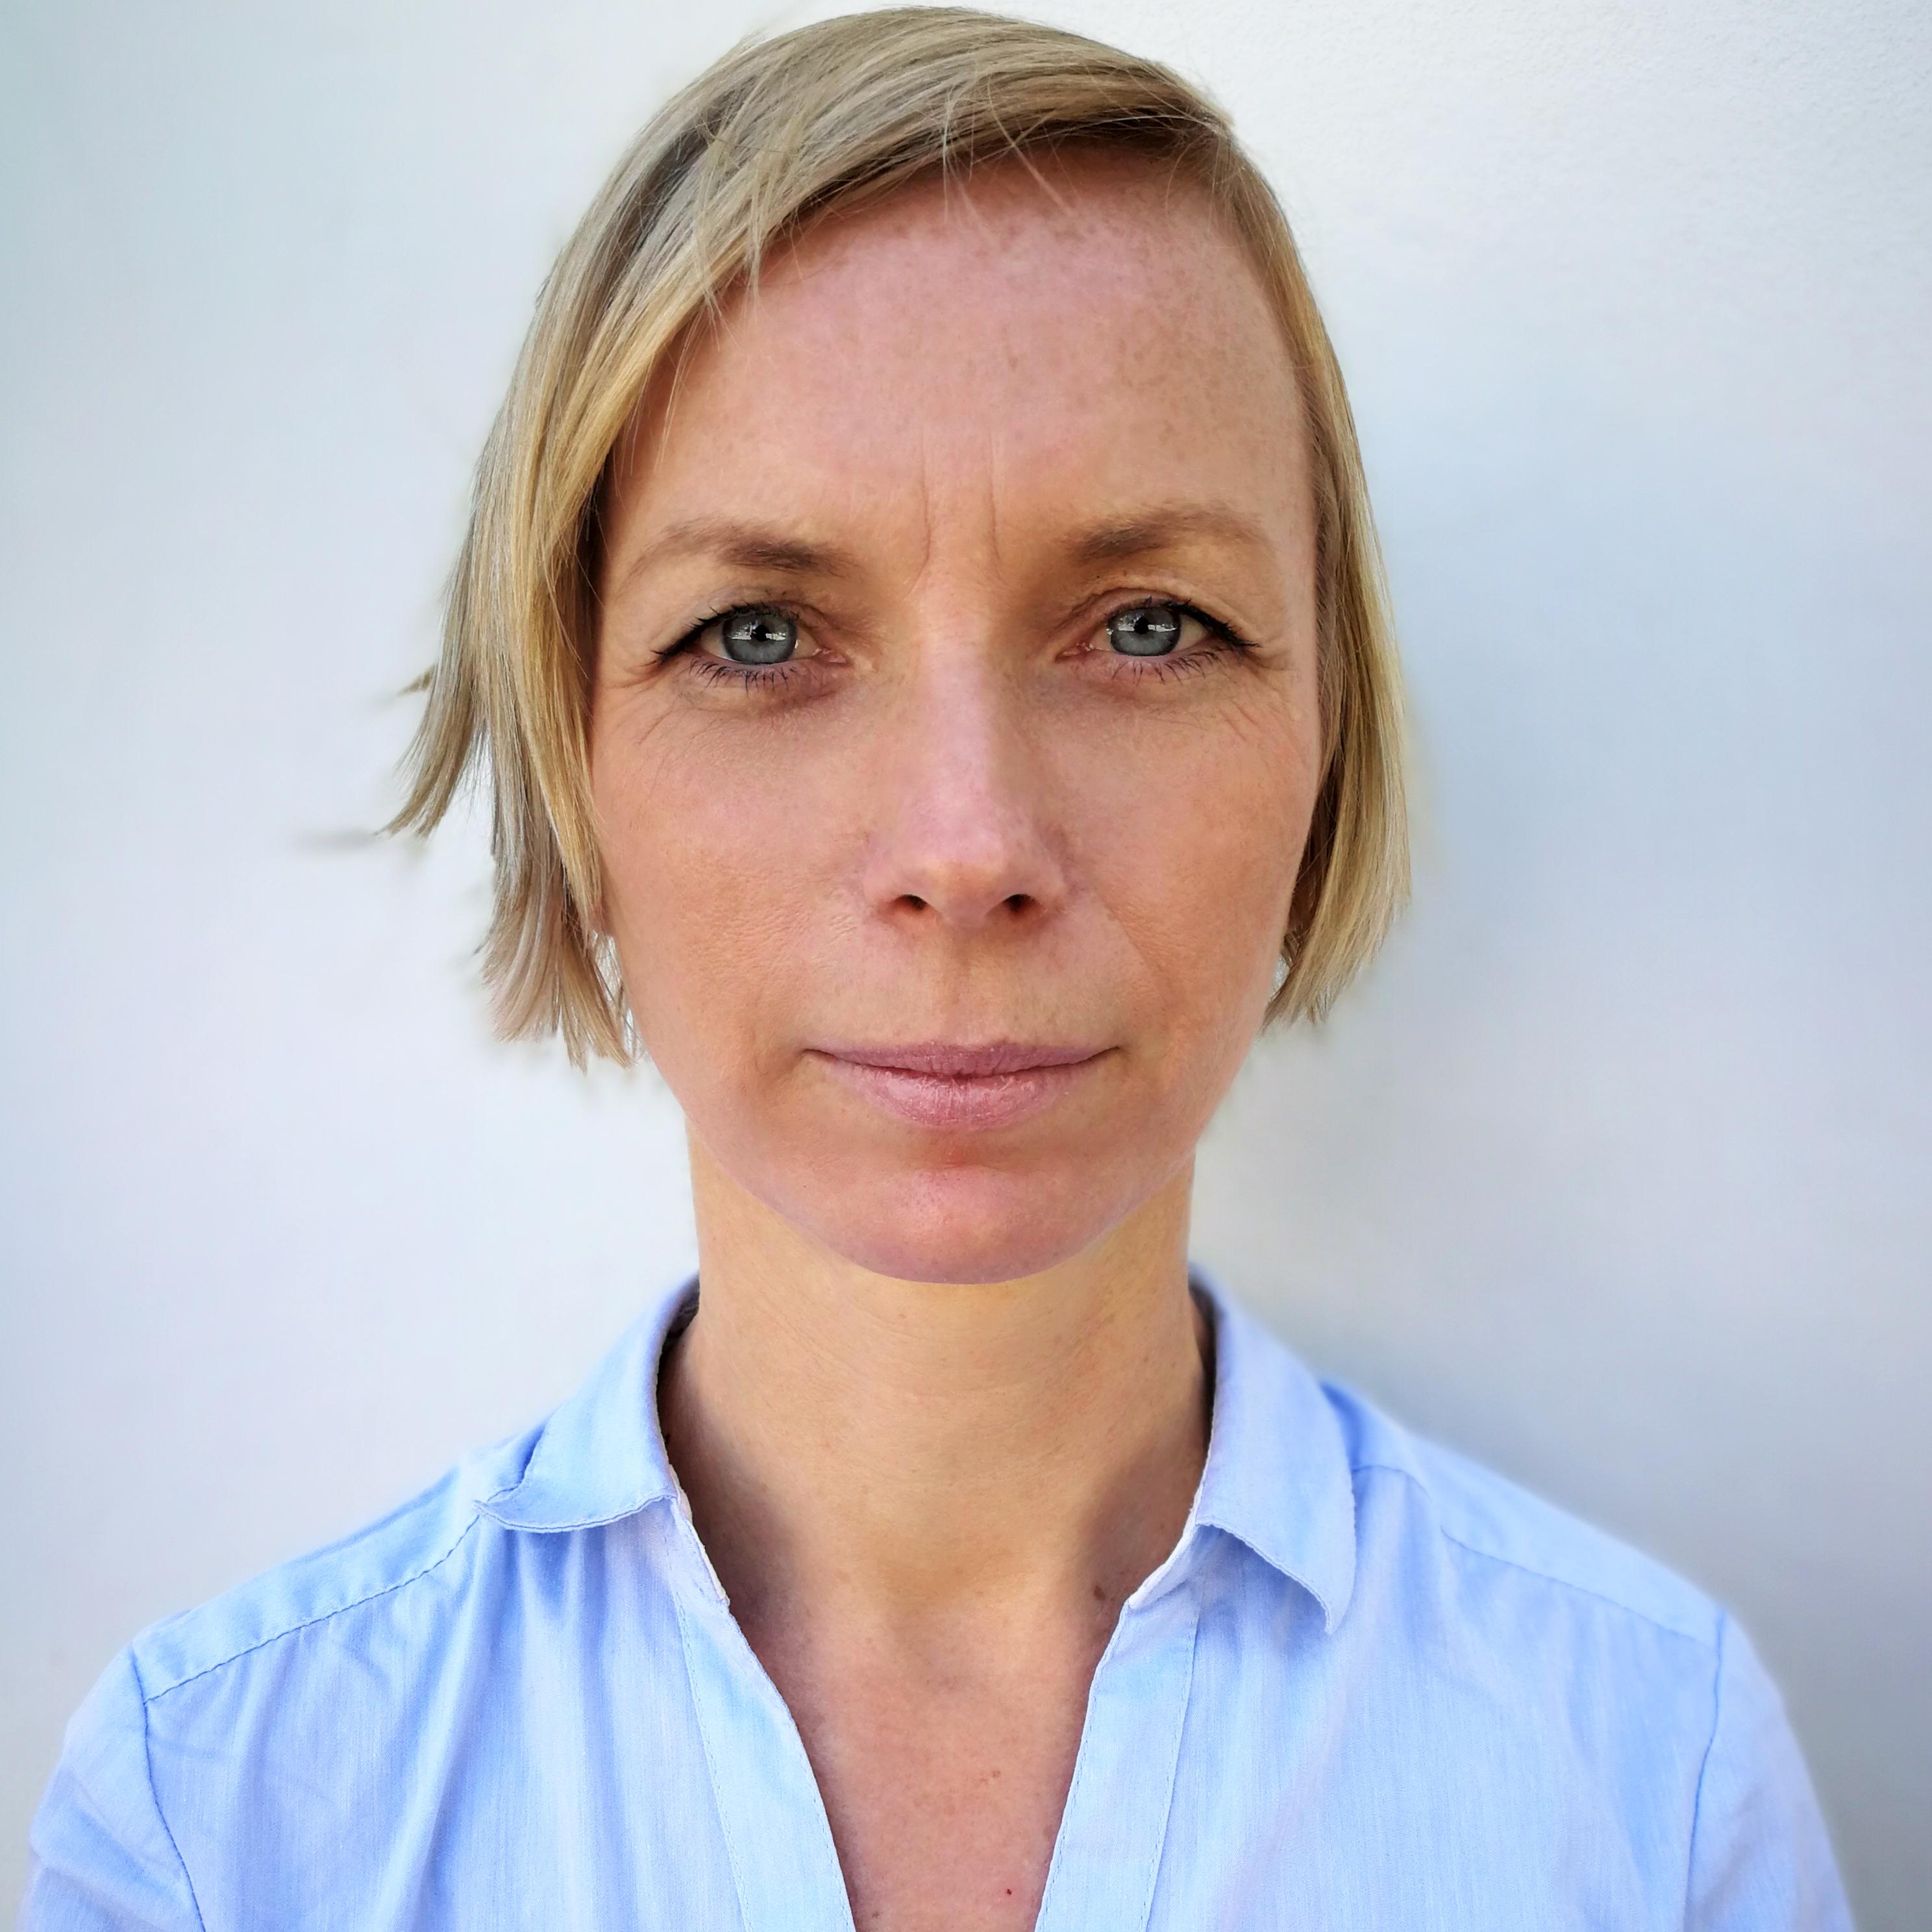 Andrea Frenová